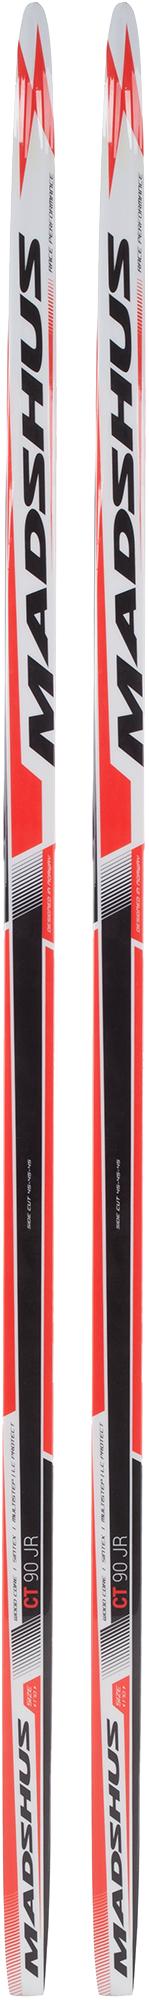 Madshus Беговые лыжи юниорские Madshus CT-90 Jr XС, размер 160